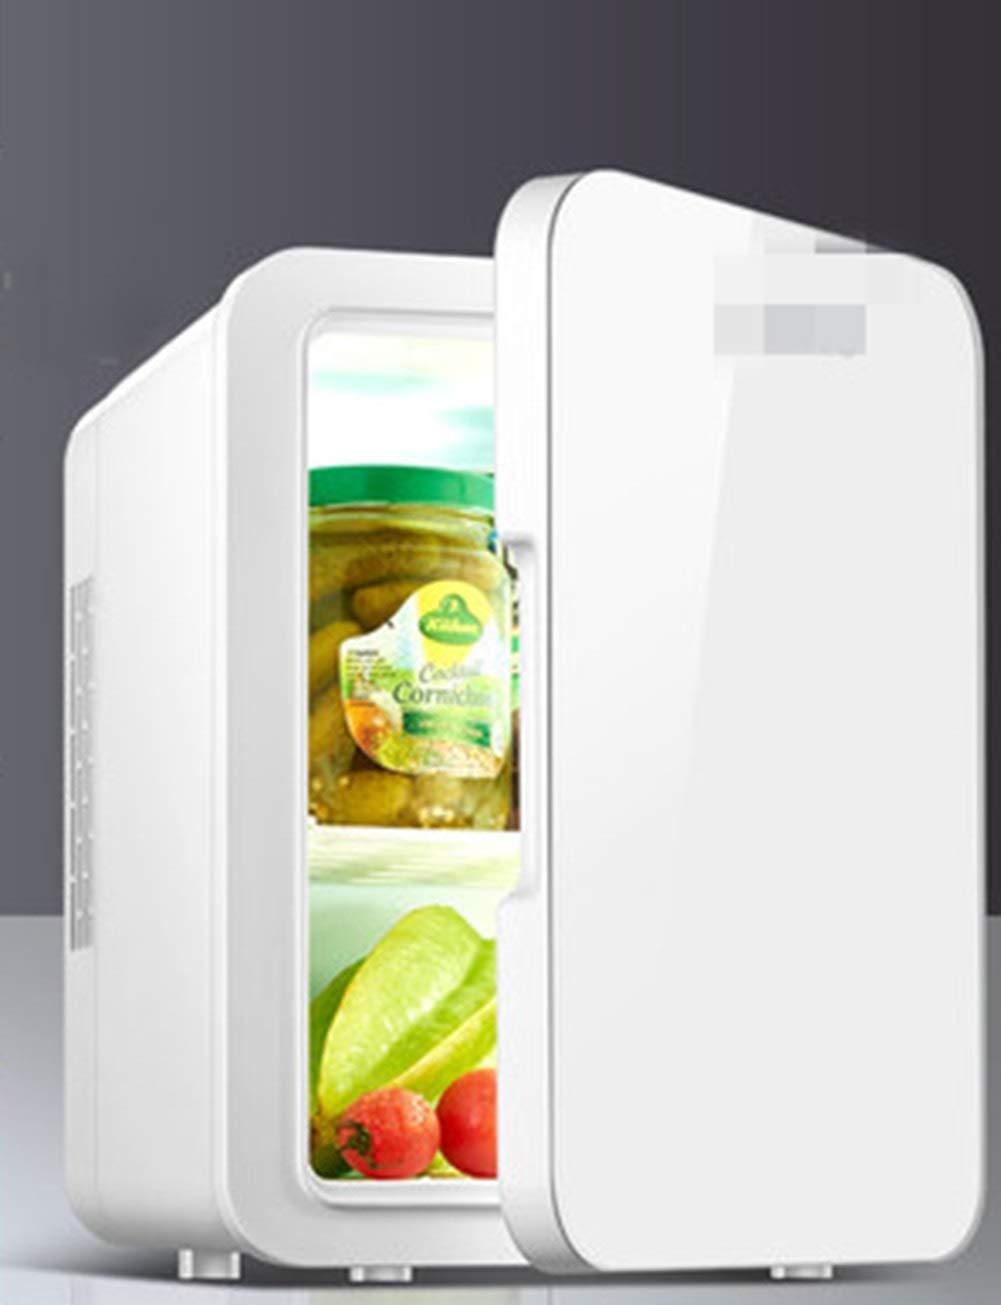 QPSGB 車の冷蔵庫 - 小さな家庭用化粧品冷凍学生寮寮の車の冷蔵庫 (色 : E)  E B07RNLPVQG